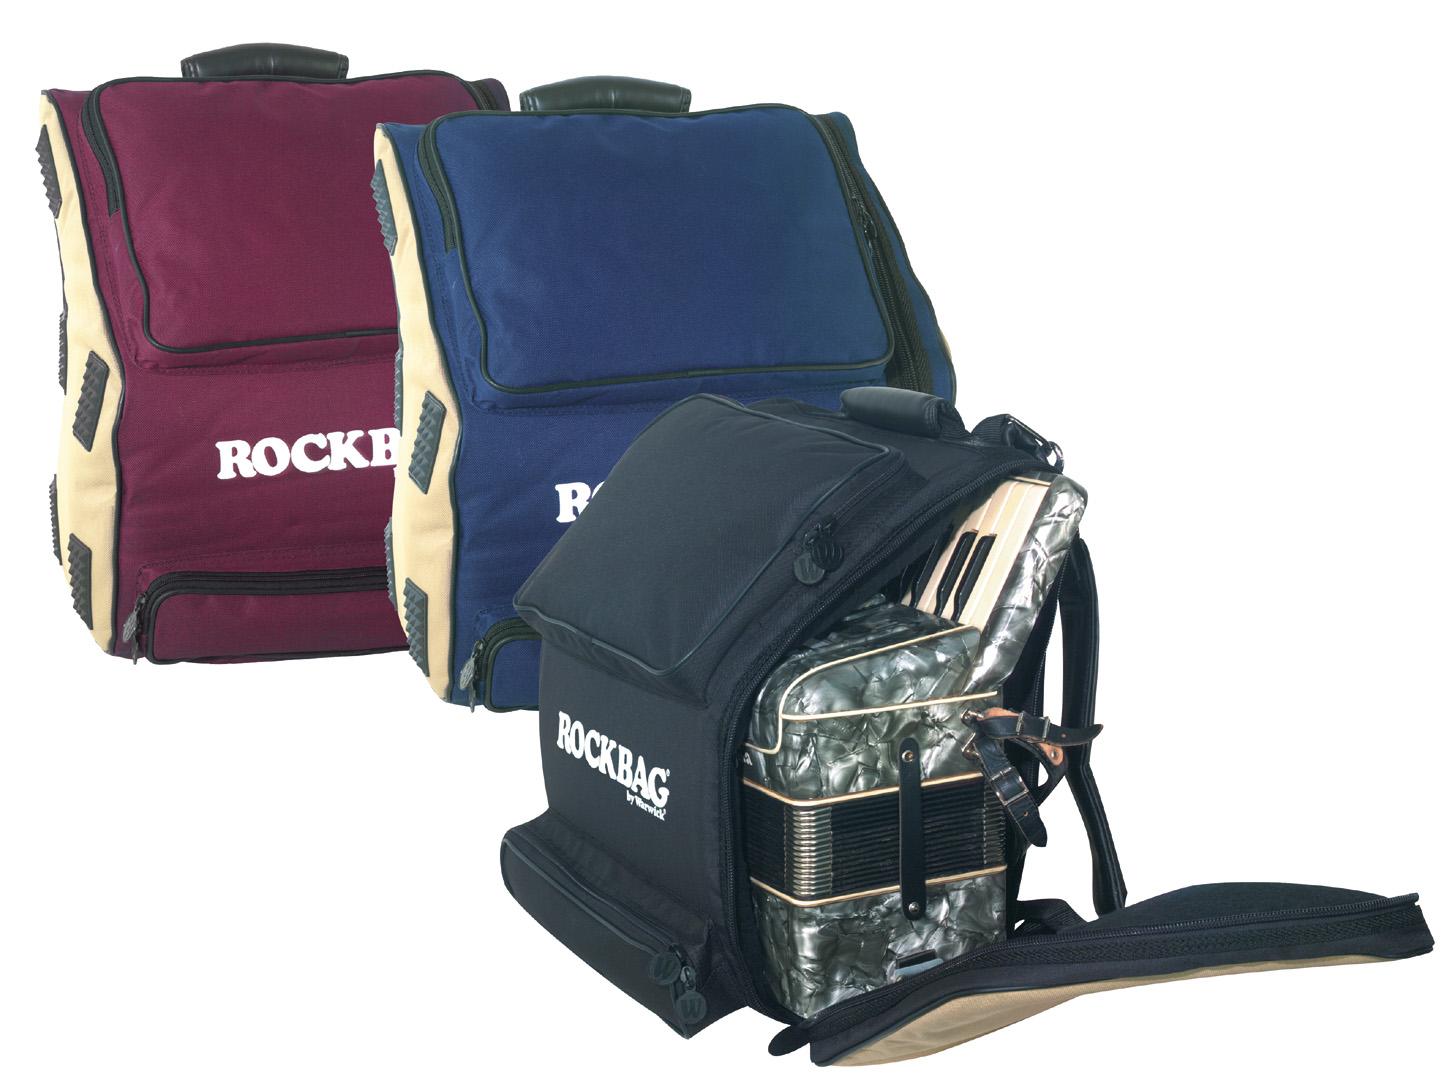 Rockbag RB 25100 B/BE Borsa Premium per fisarmonica 26/48